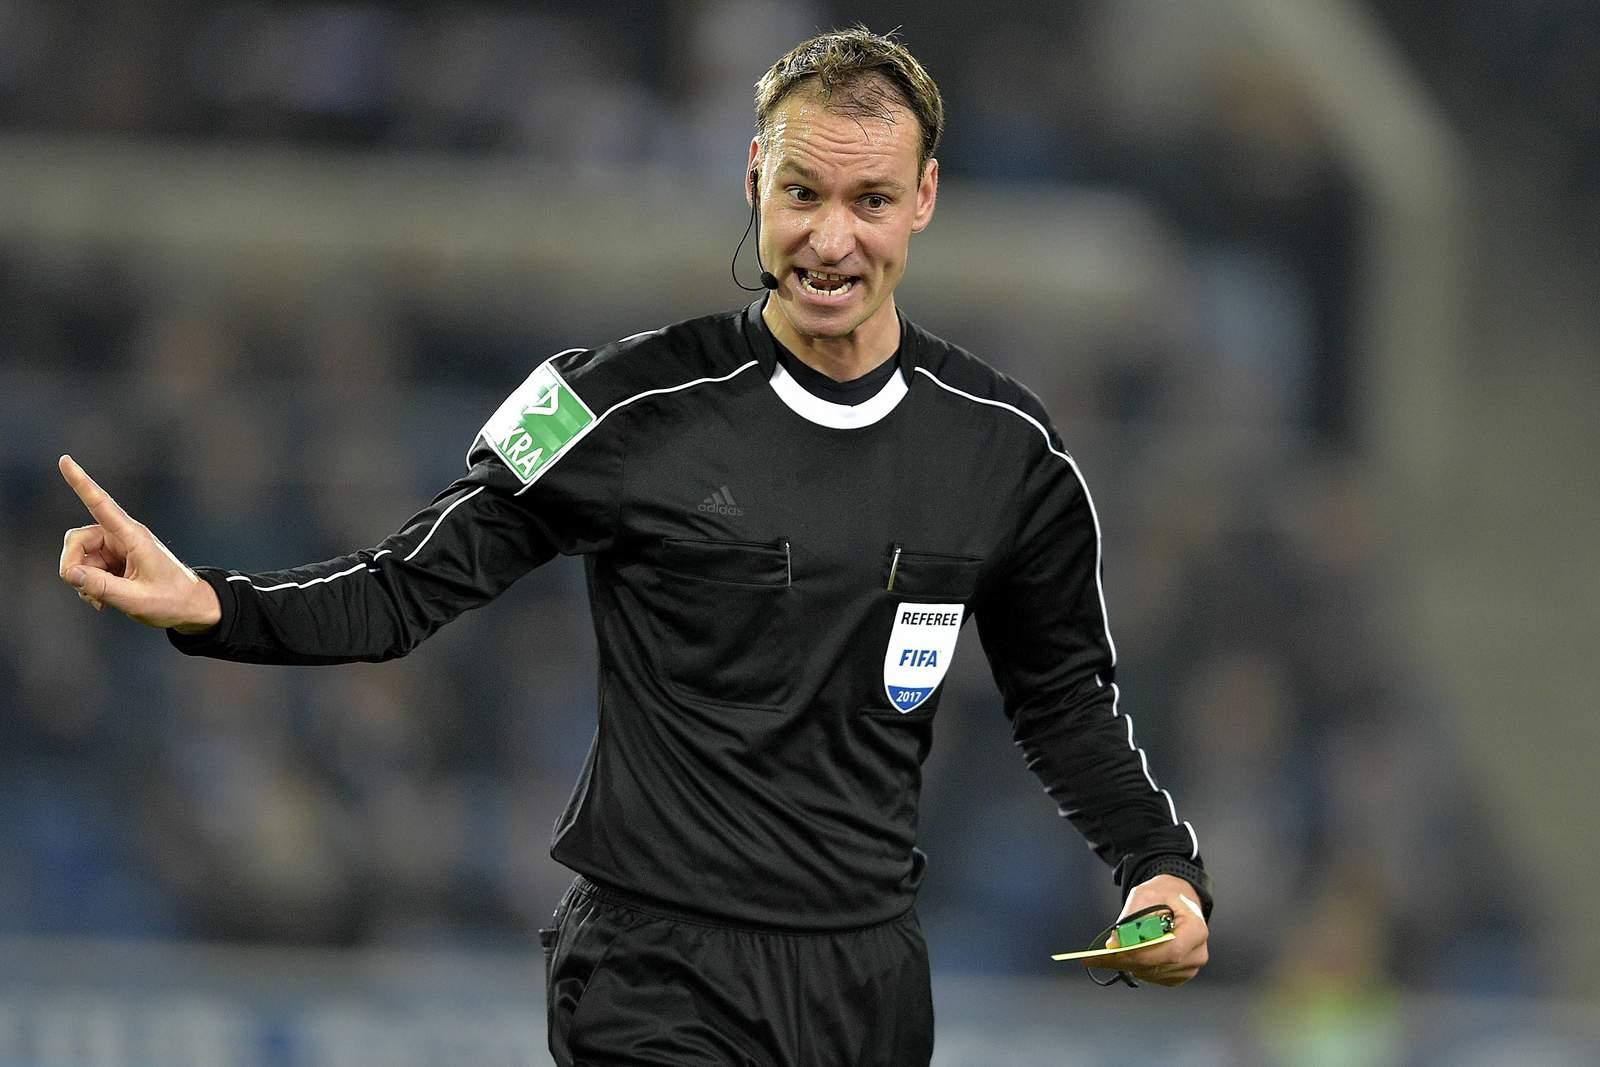 FIFA-Schiedsrichter Bastian Dankert in der 3. Liga